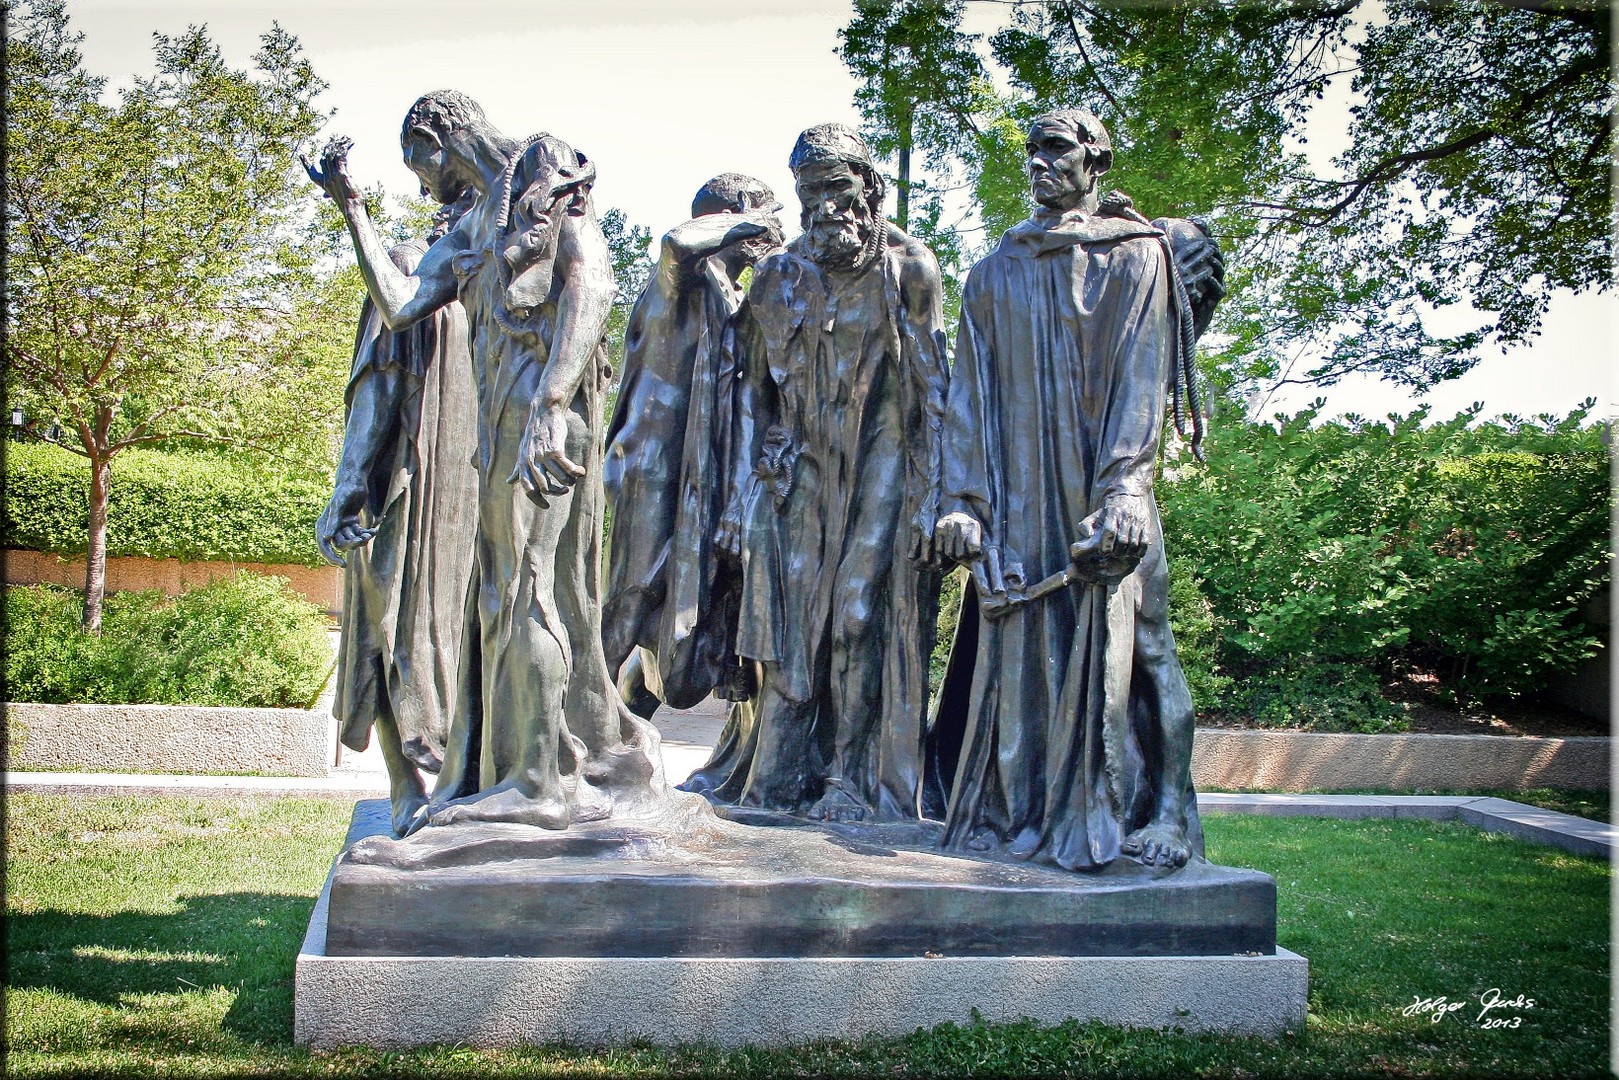 Auguste Rodin - The Burgher of Calais at Hirshhorn Art Gallery Washington DC